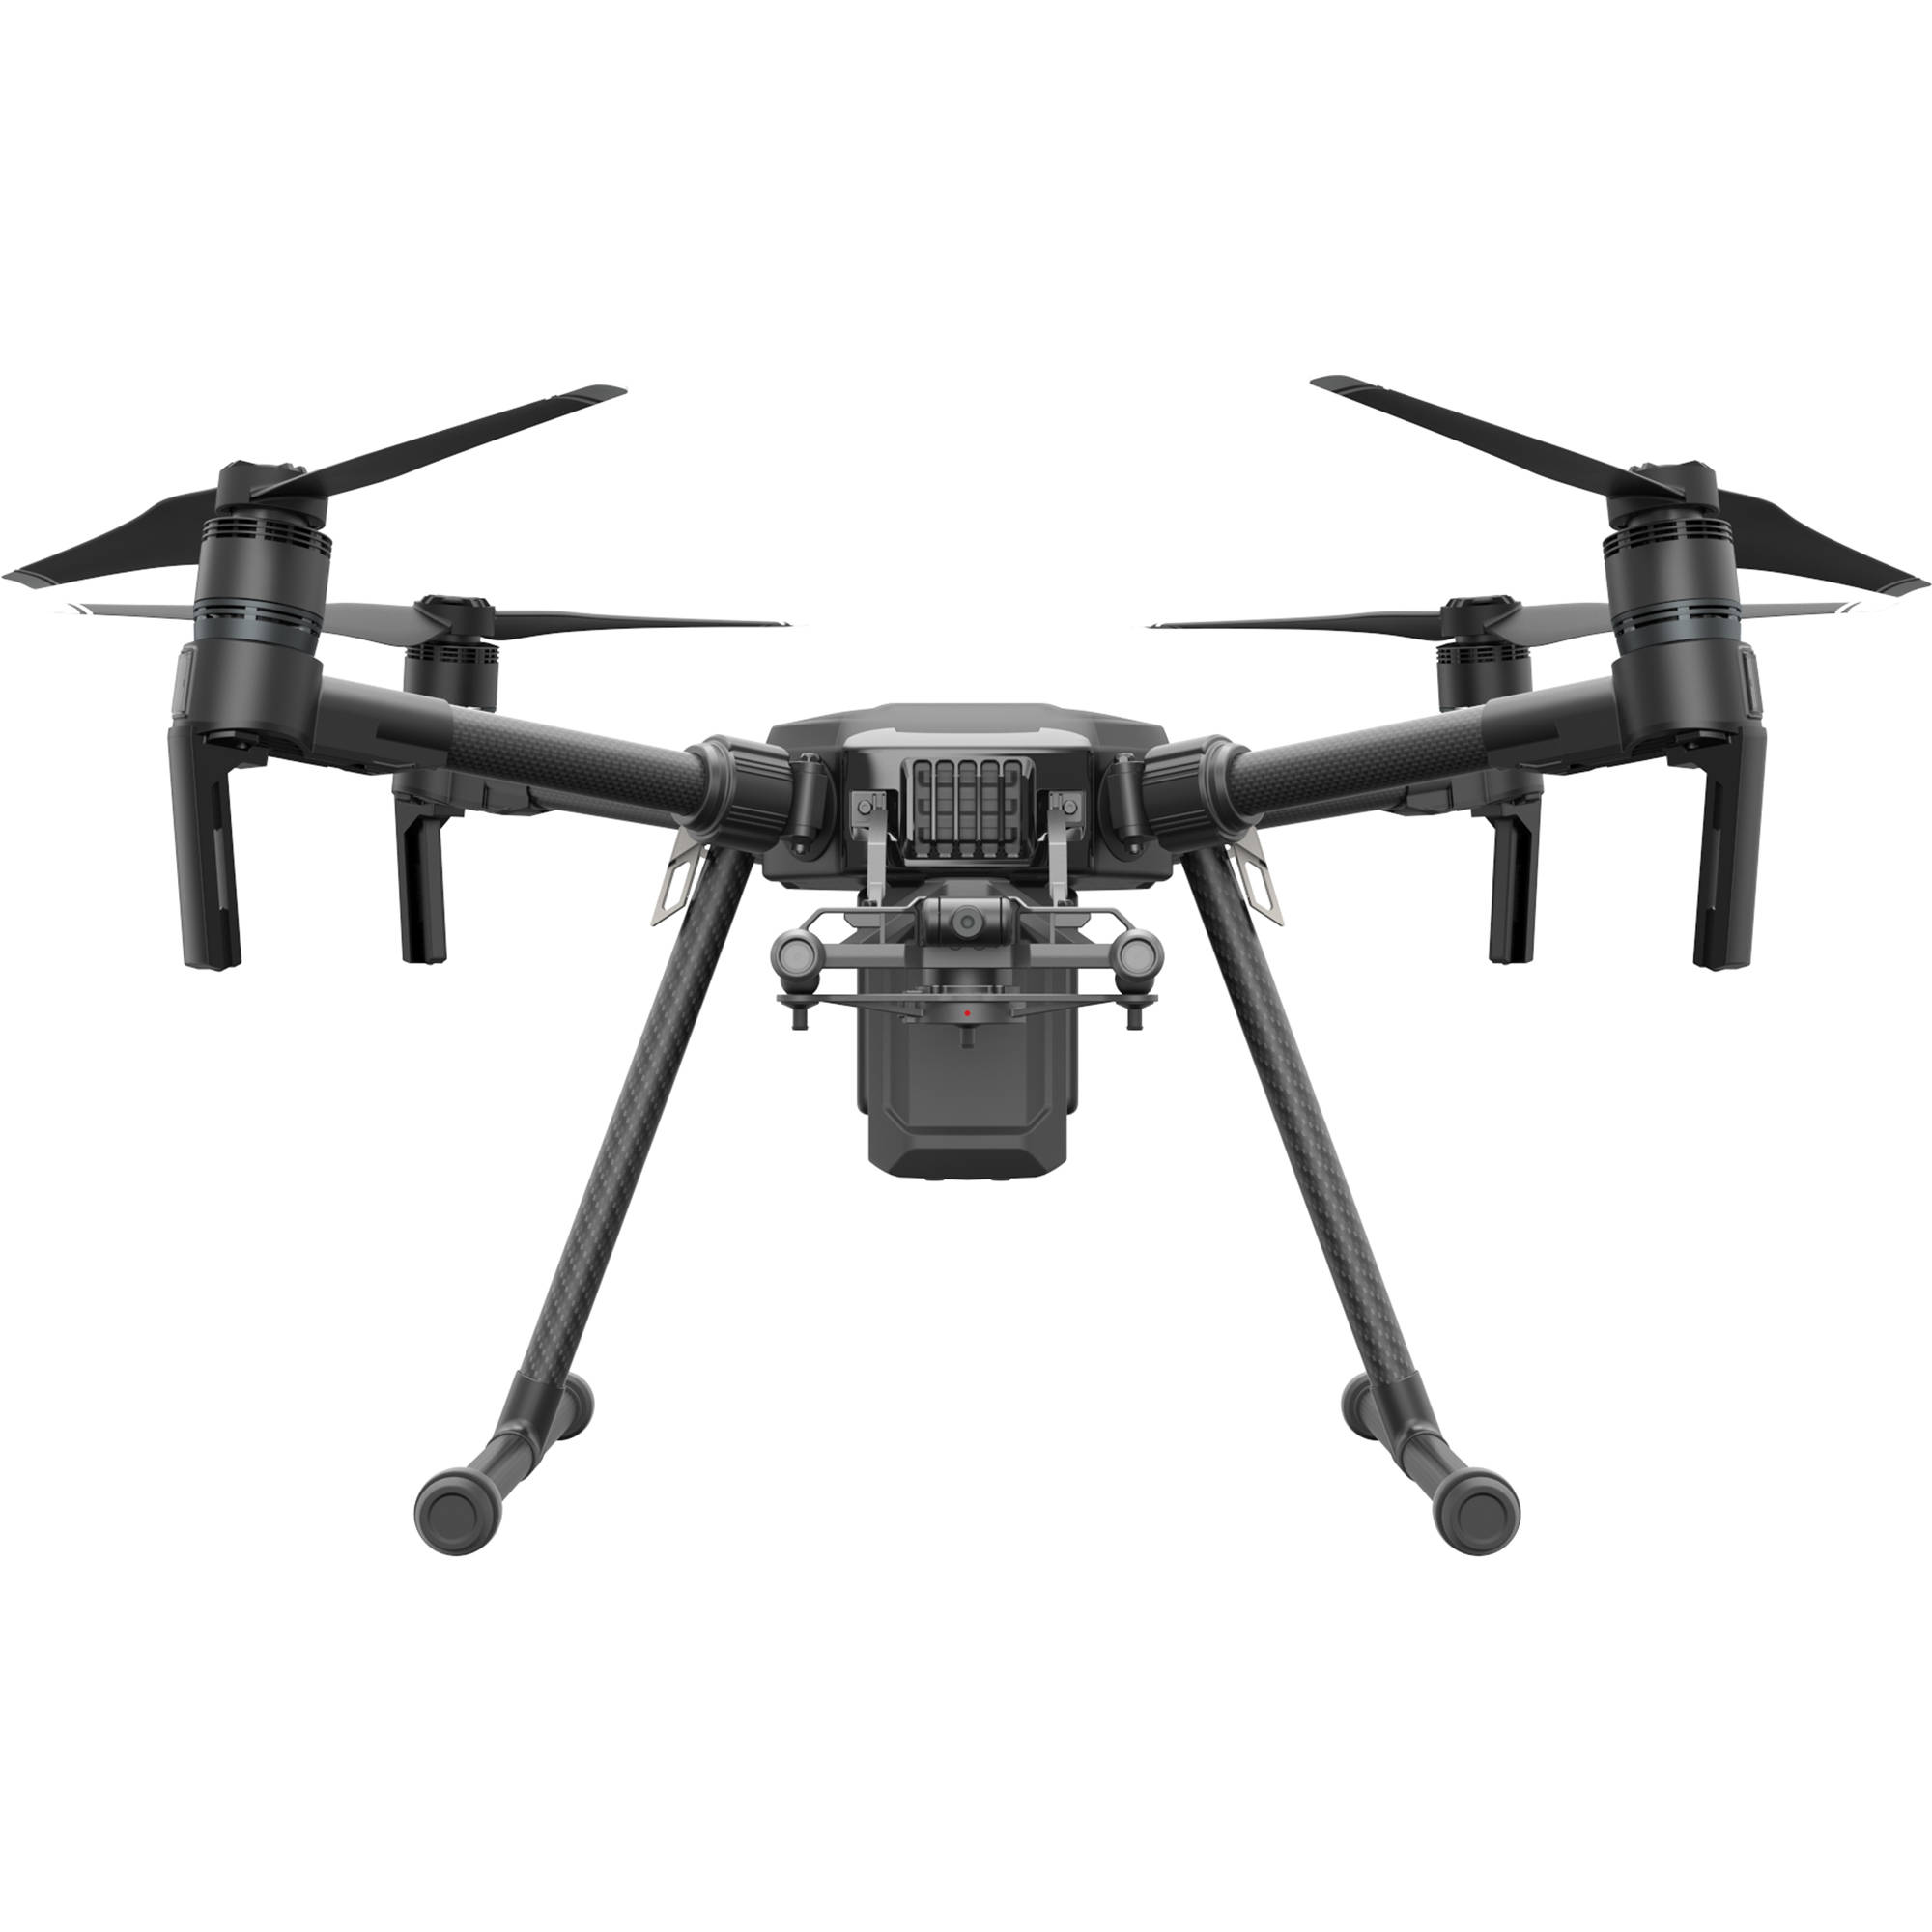 DJI Matrice 200 Professional Quadcopter CP HY 000041 B&H Photo